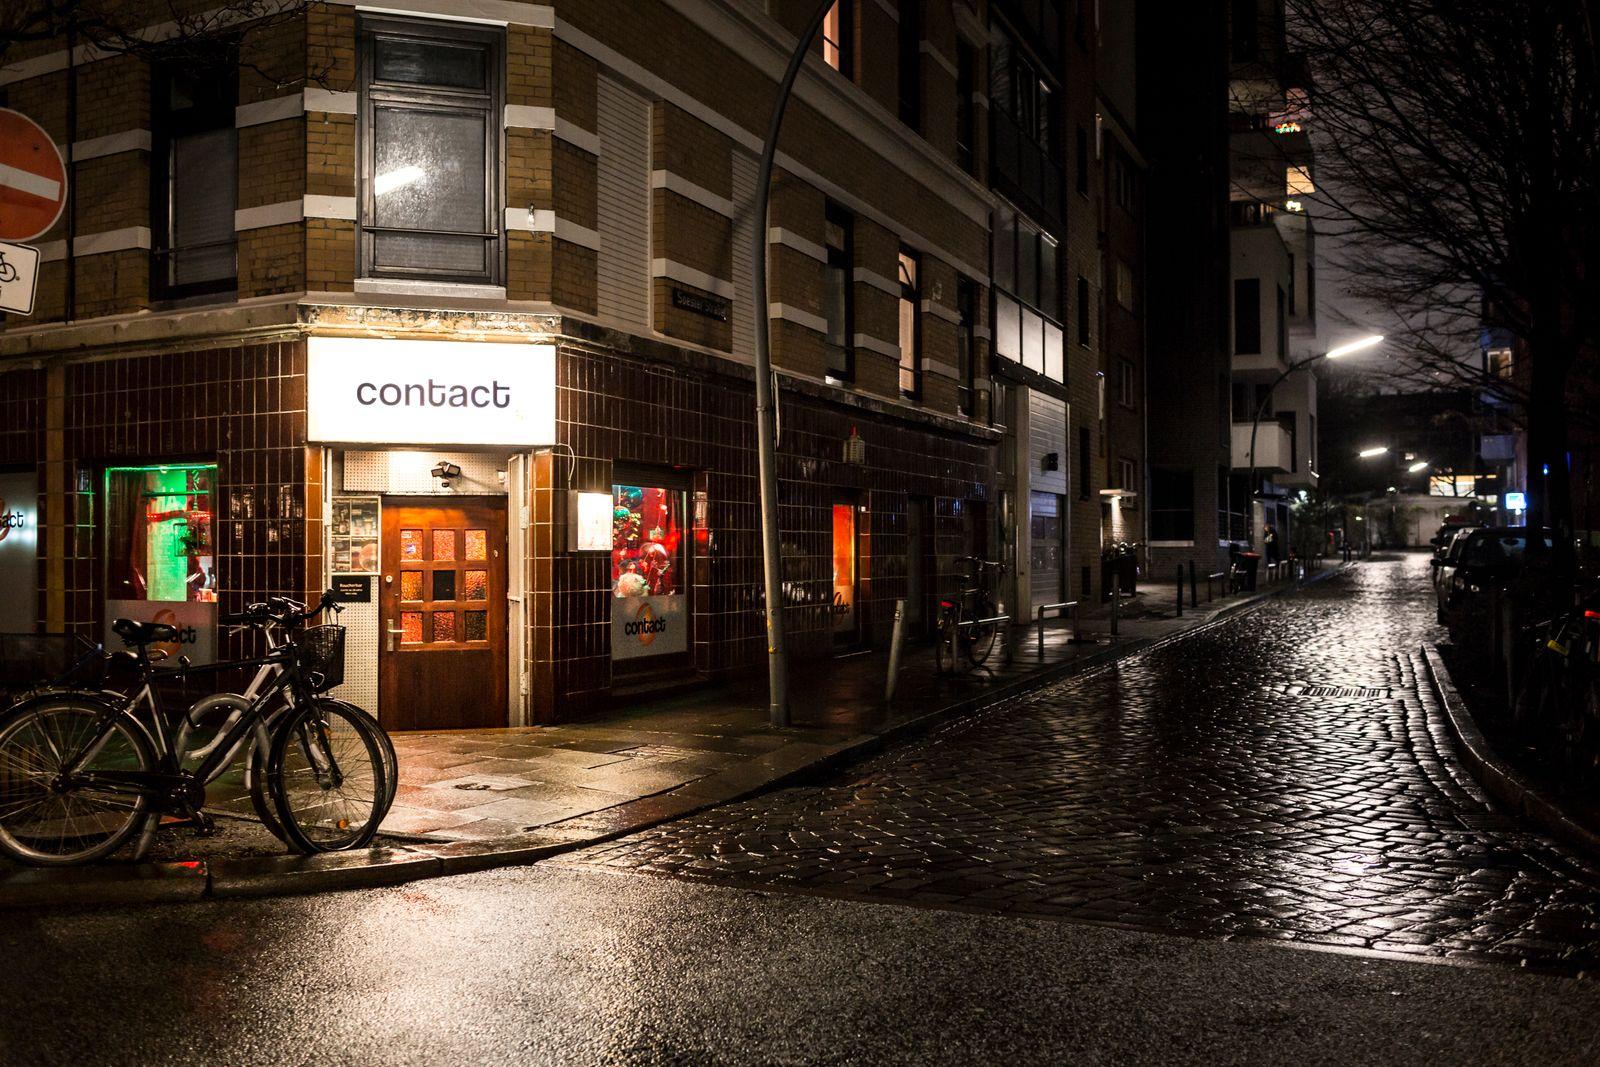 Schwul in der DDR - Contact Bar in St. Georg/Hamburg, Michael Dotzauer